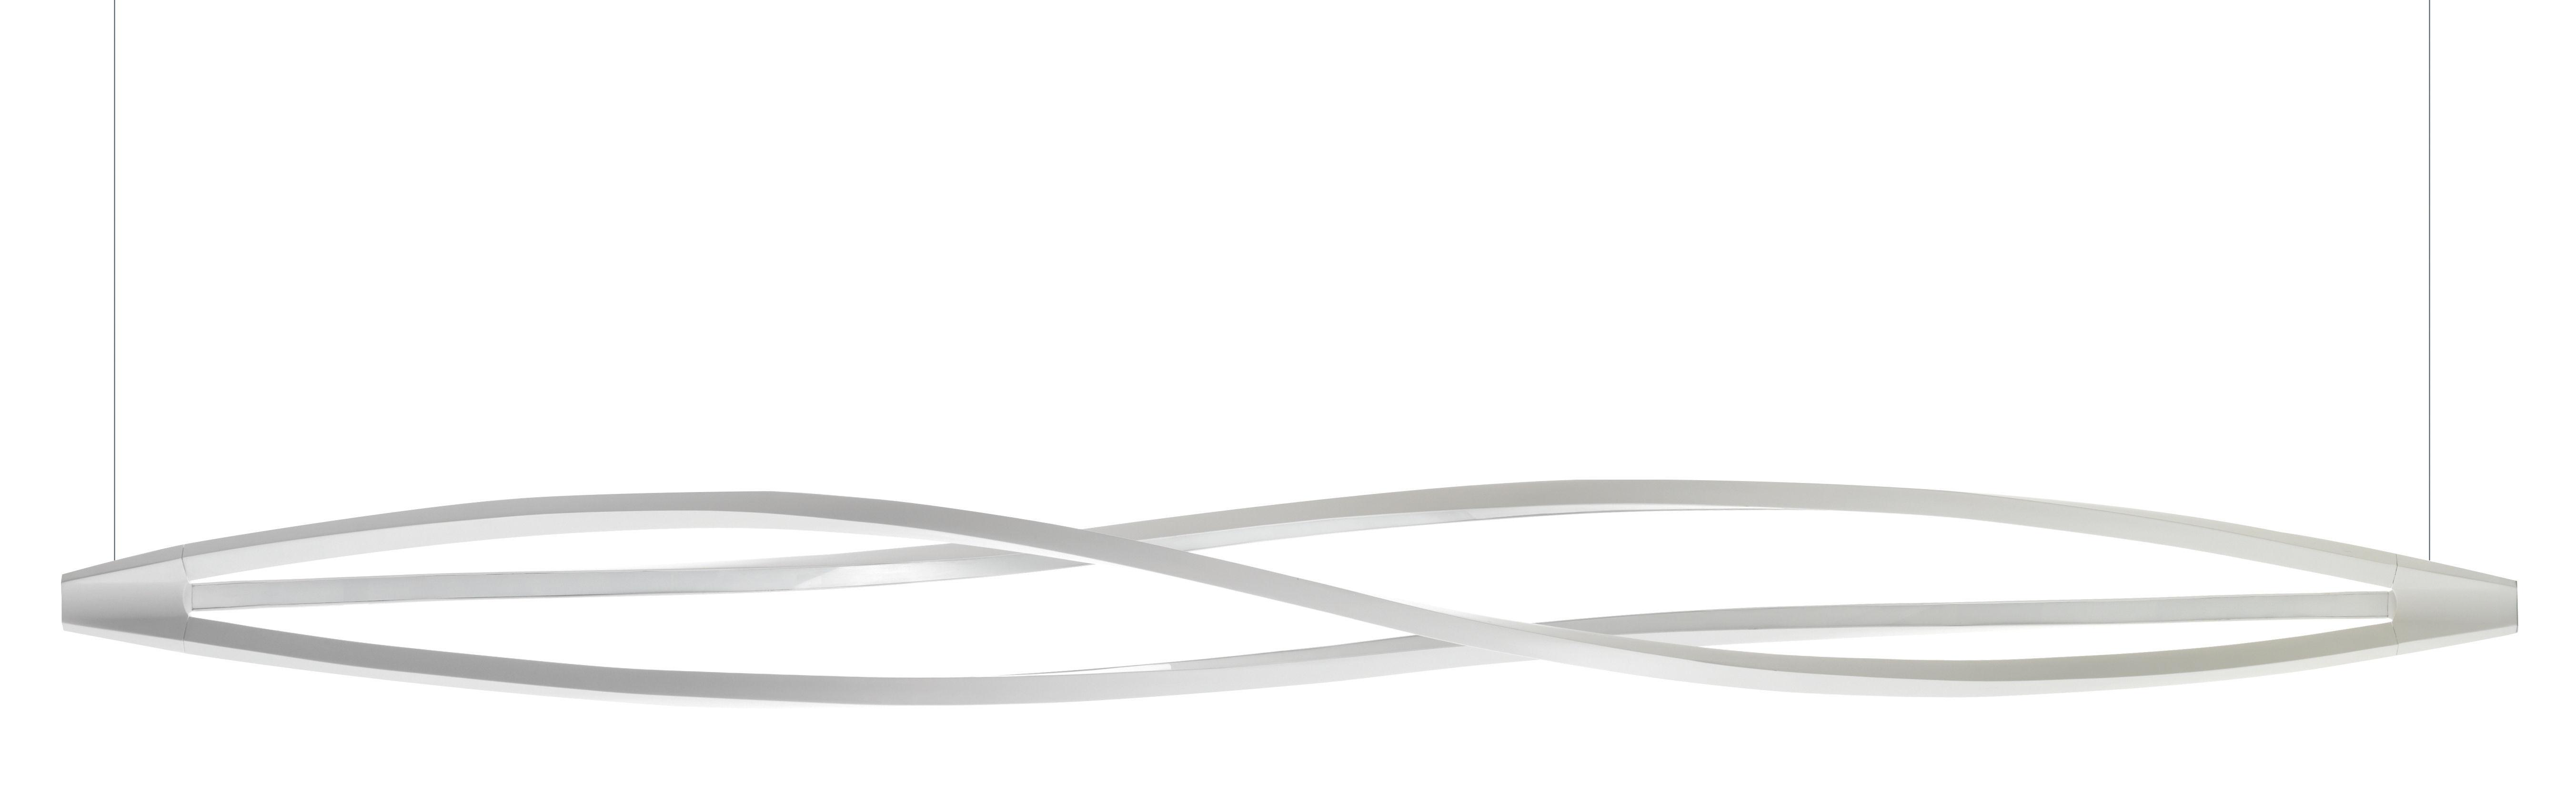 Luminaire - Suspensions - Suspension In the wind LED / Horizontale - L 183 cm - Nemo - Horizontale - Blanc - Aluminium extrudé, Méthacrylate